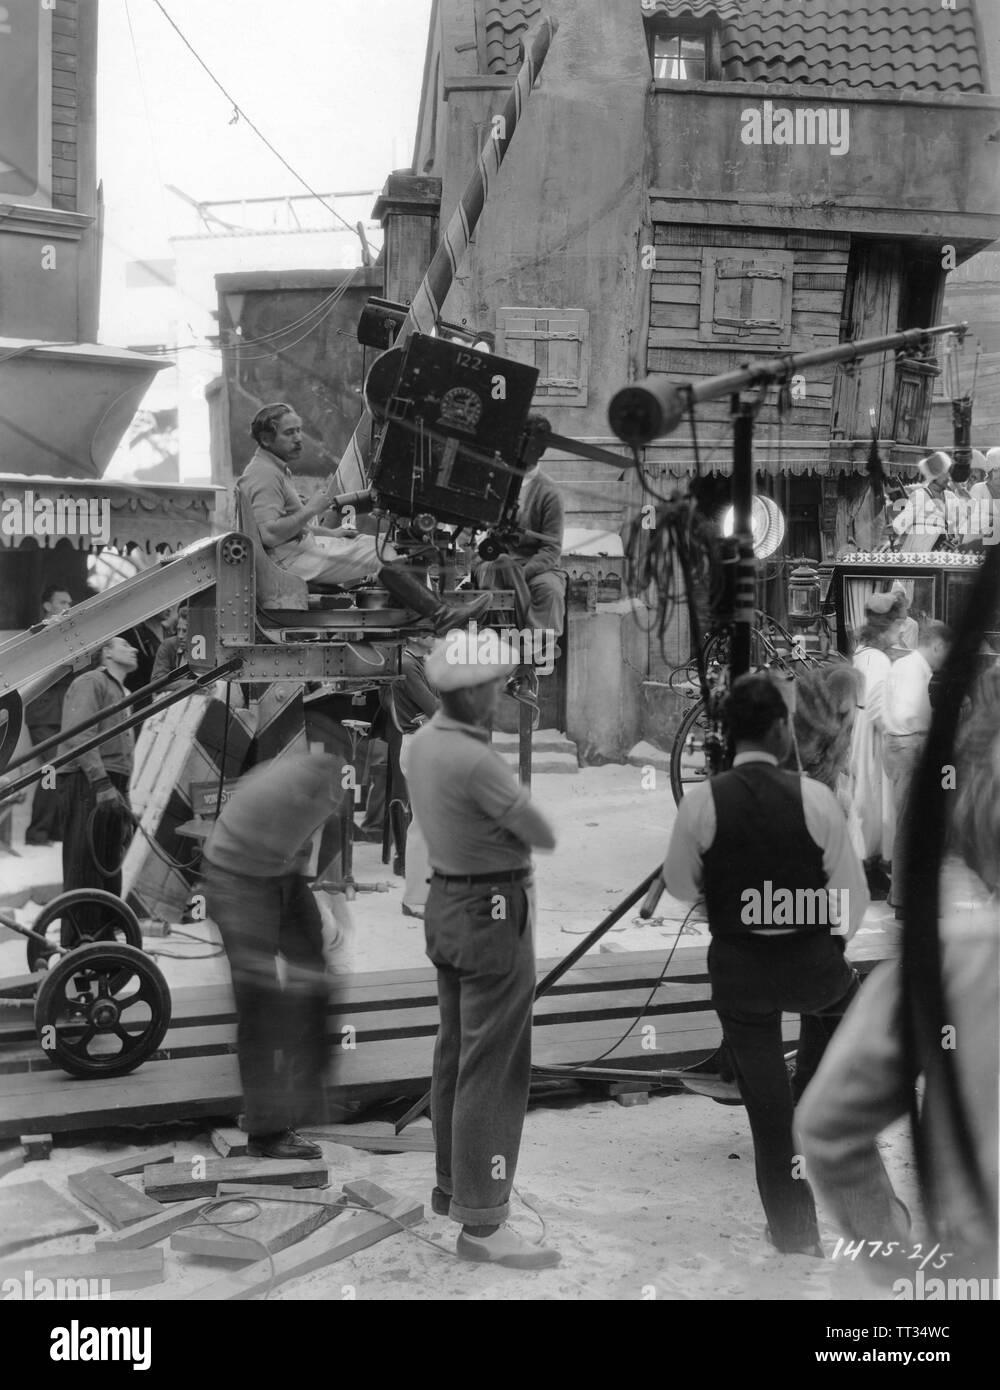 THE SCARLET EMPRESS 1934 director Josef von STERNBERG candid on set filming Paramount Pictures - Stock Image